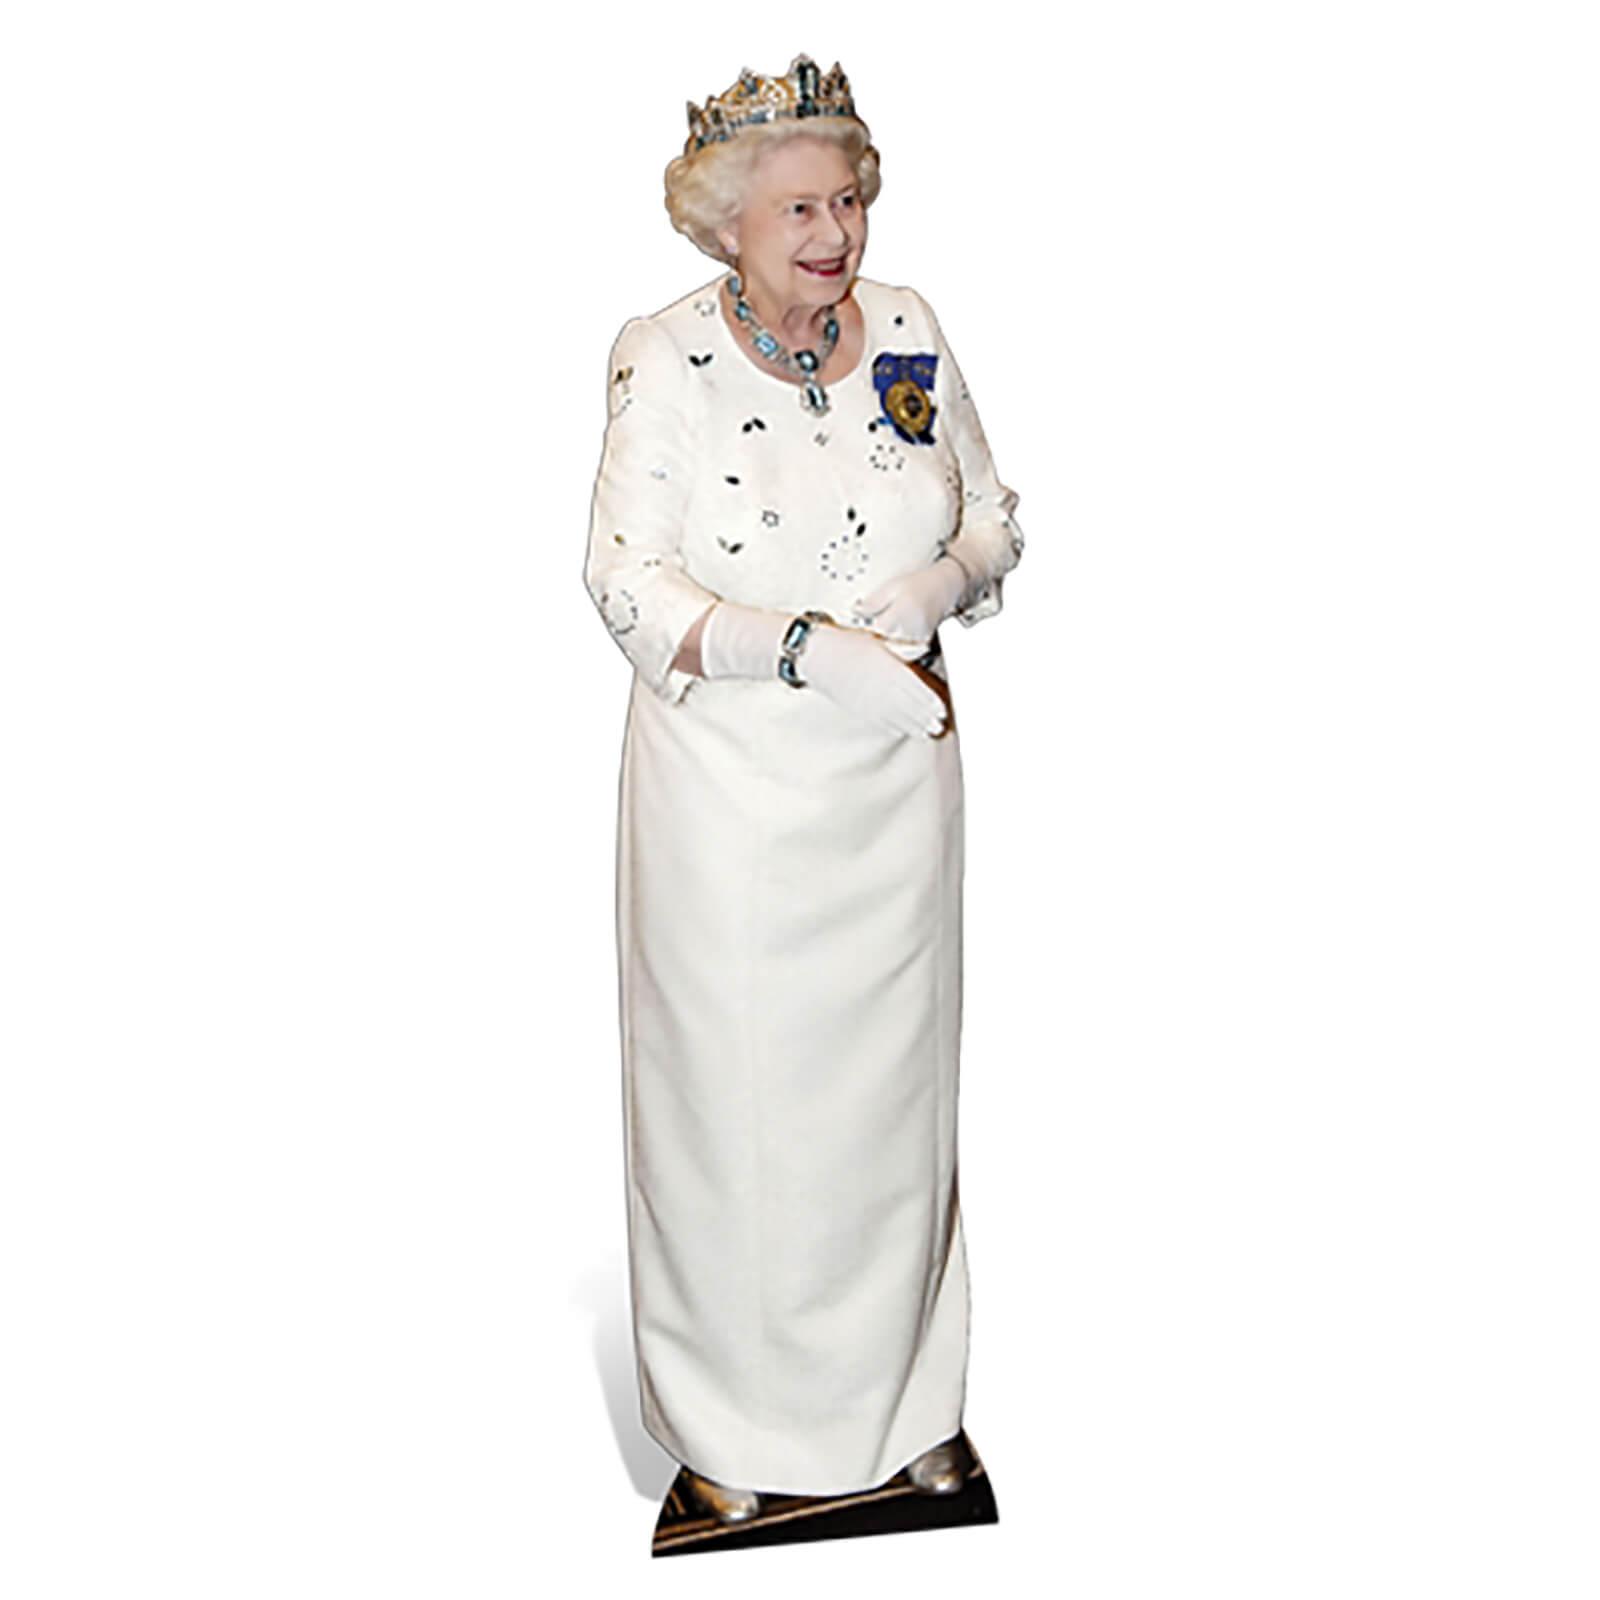 Star Cut Outs Queen Elizabeth Lifesize Cardboard Cut Out